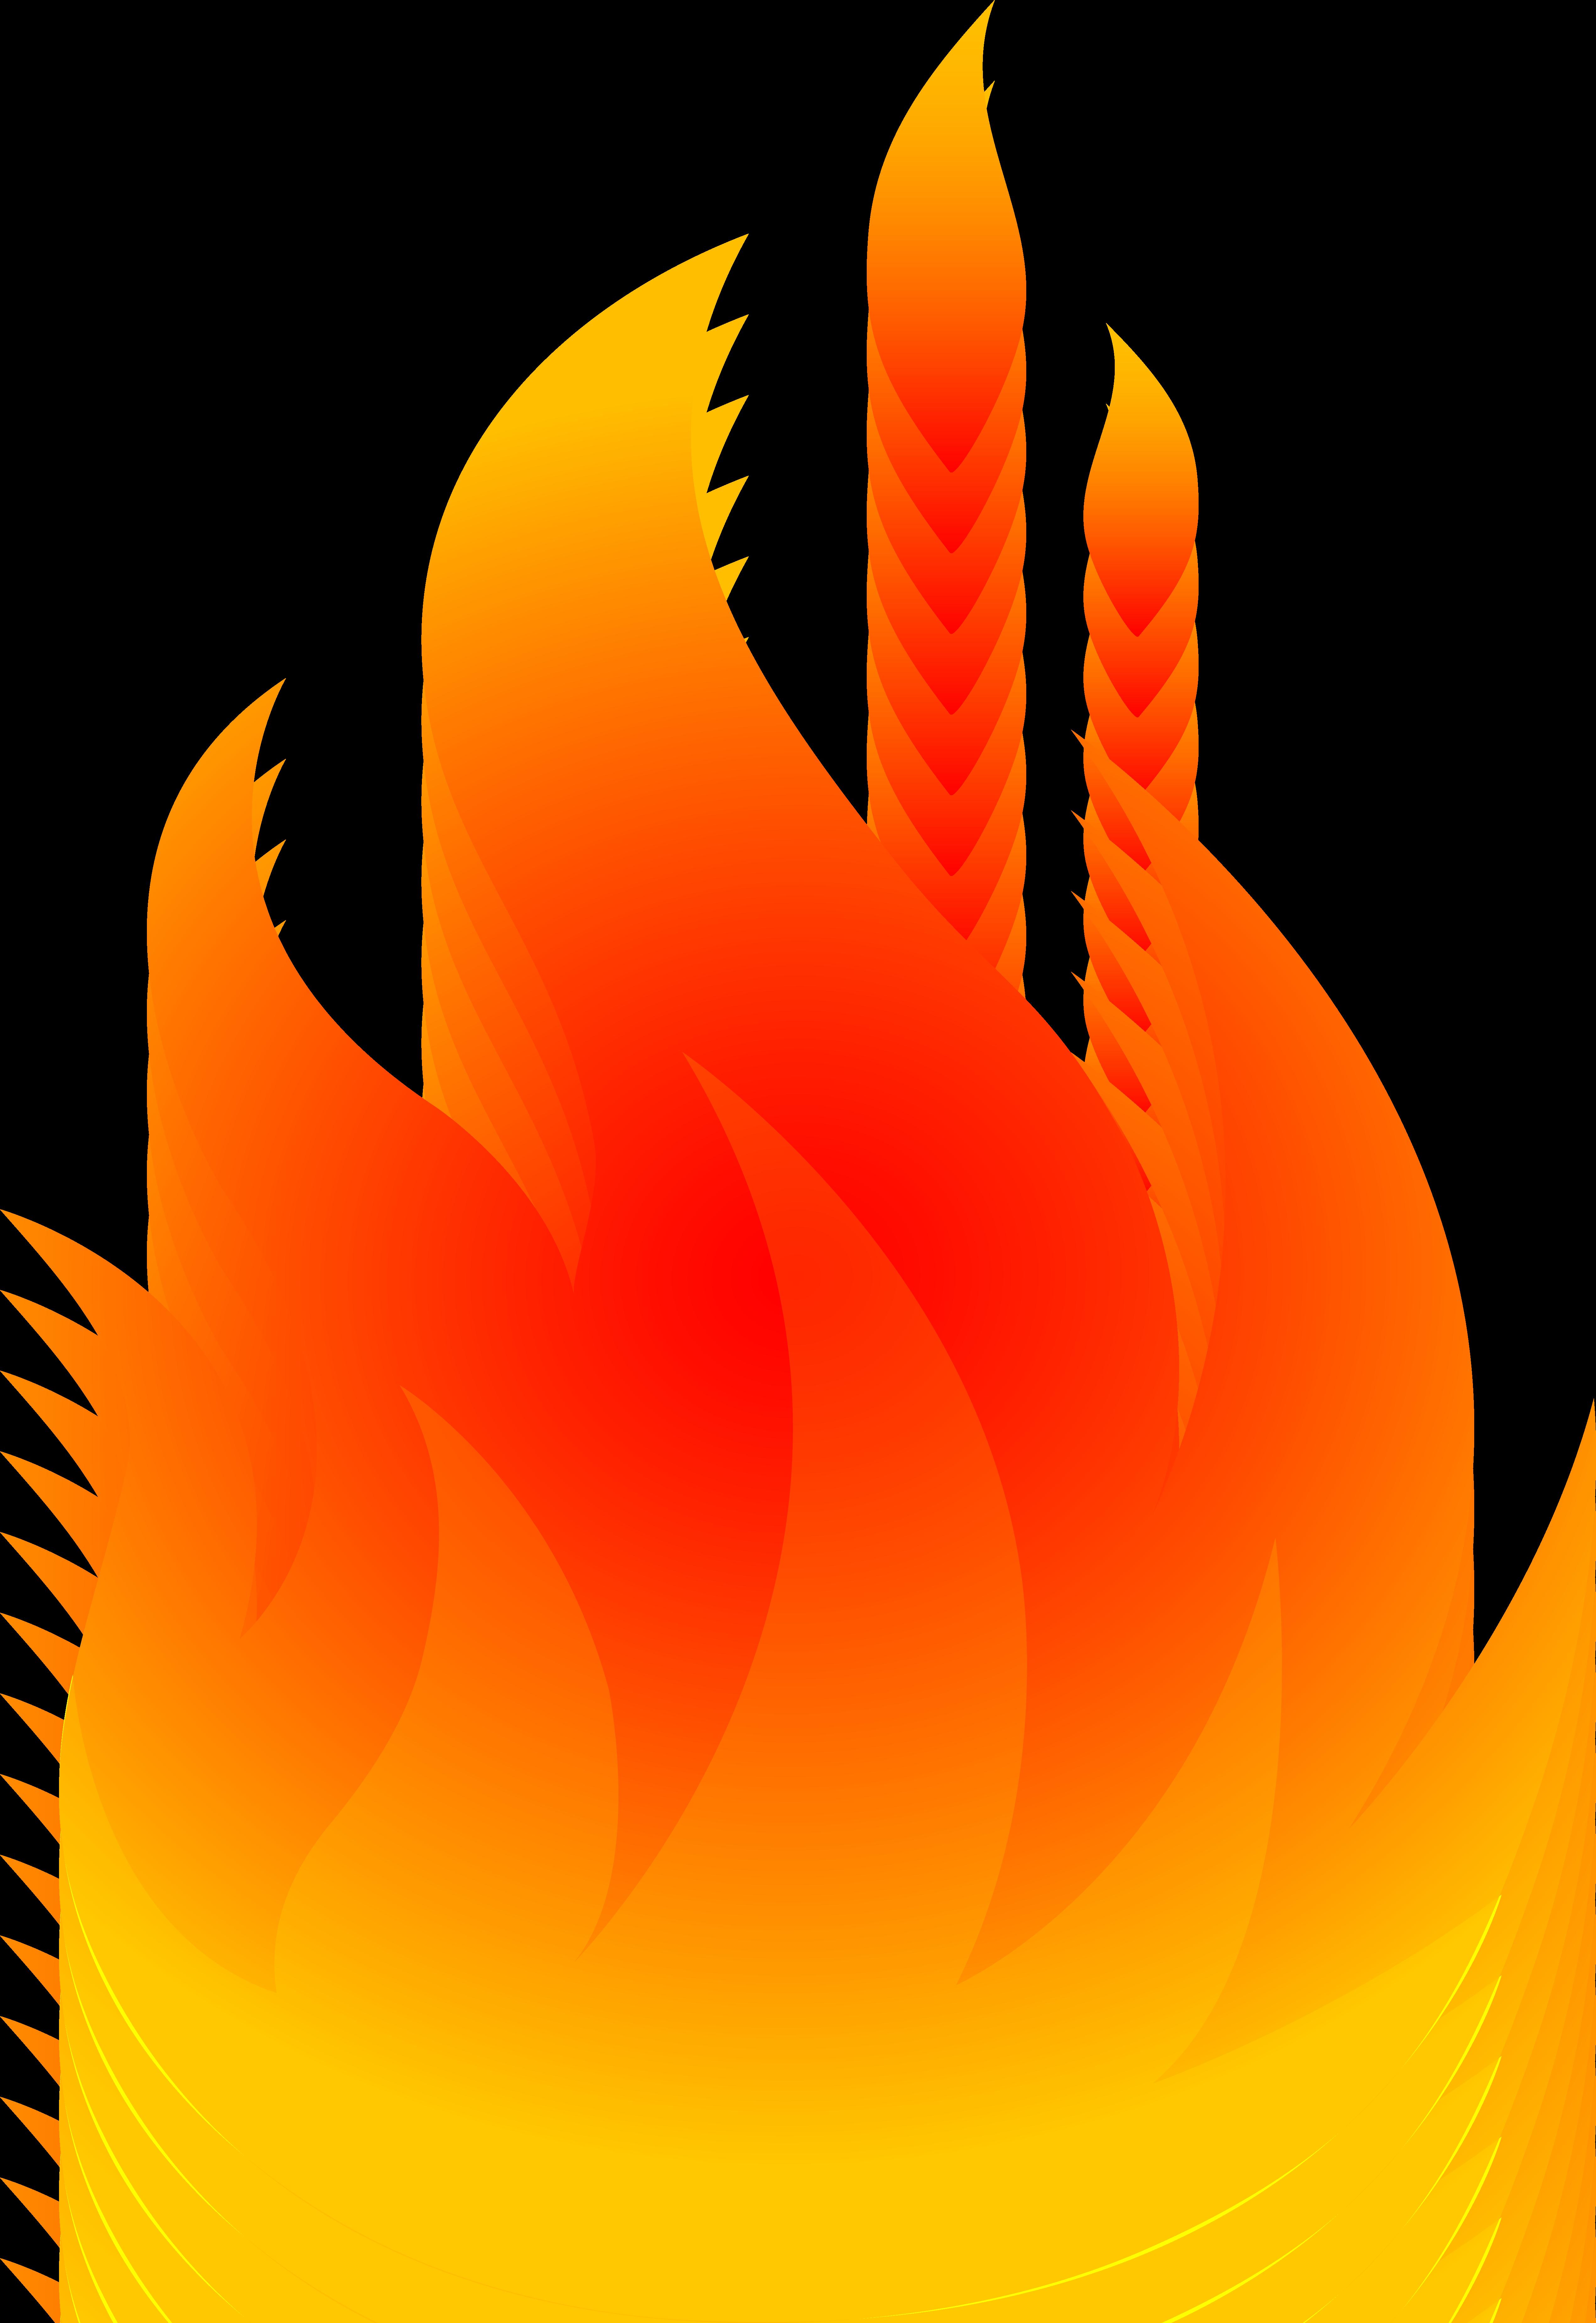 fire flames clipart free images 8 u2013 gclipart com